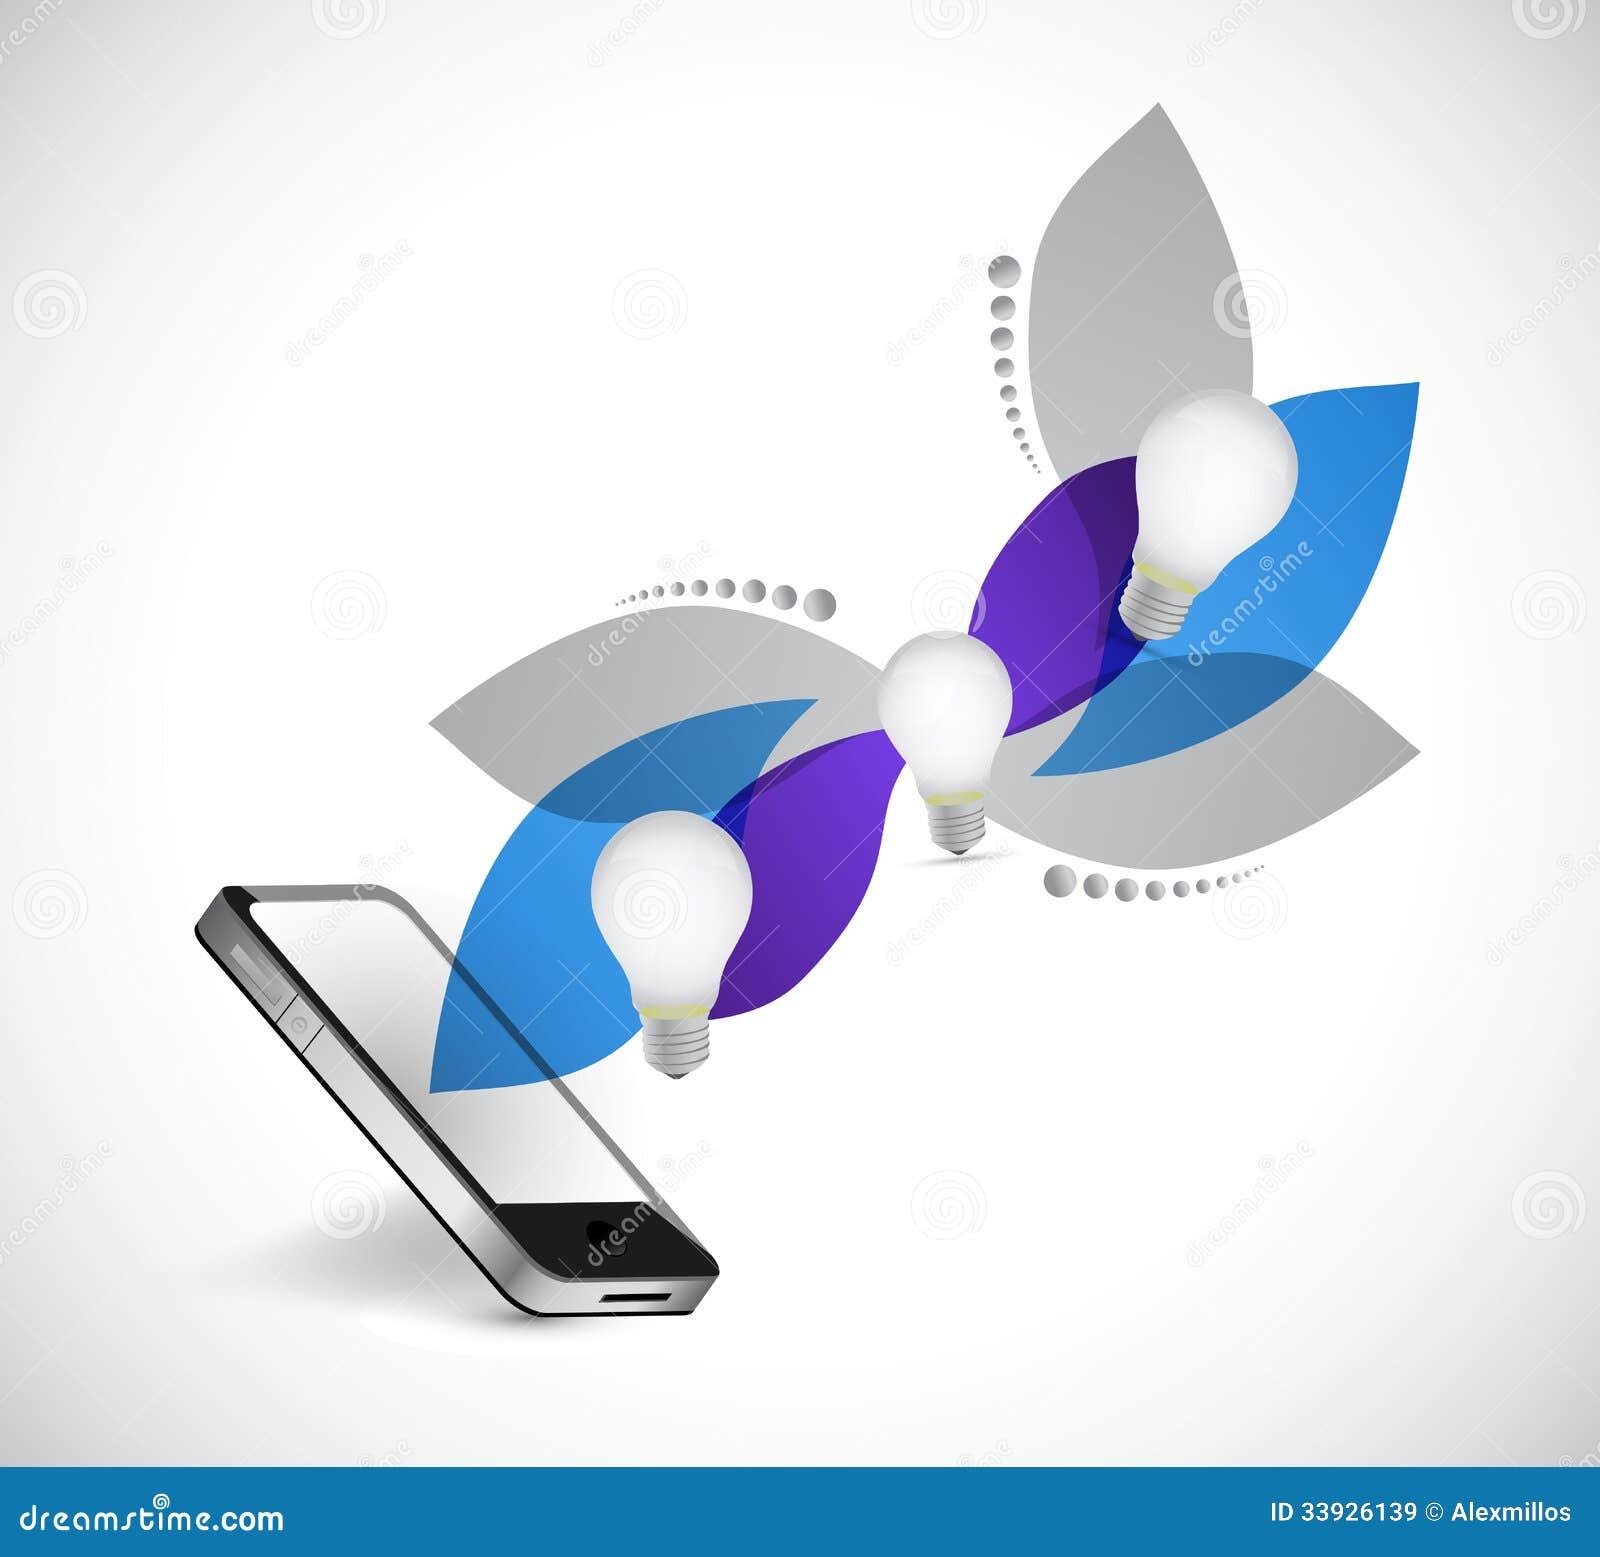 design graphic idea illustration